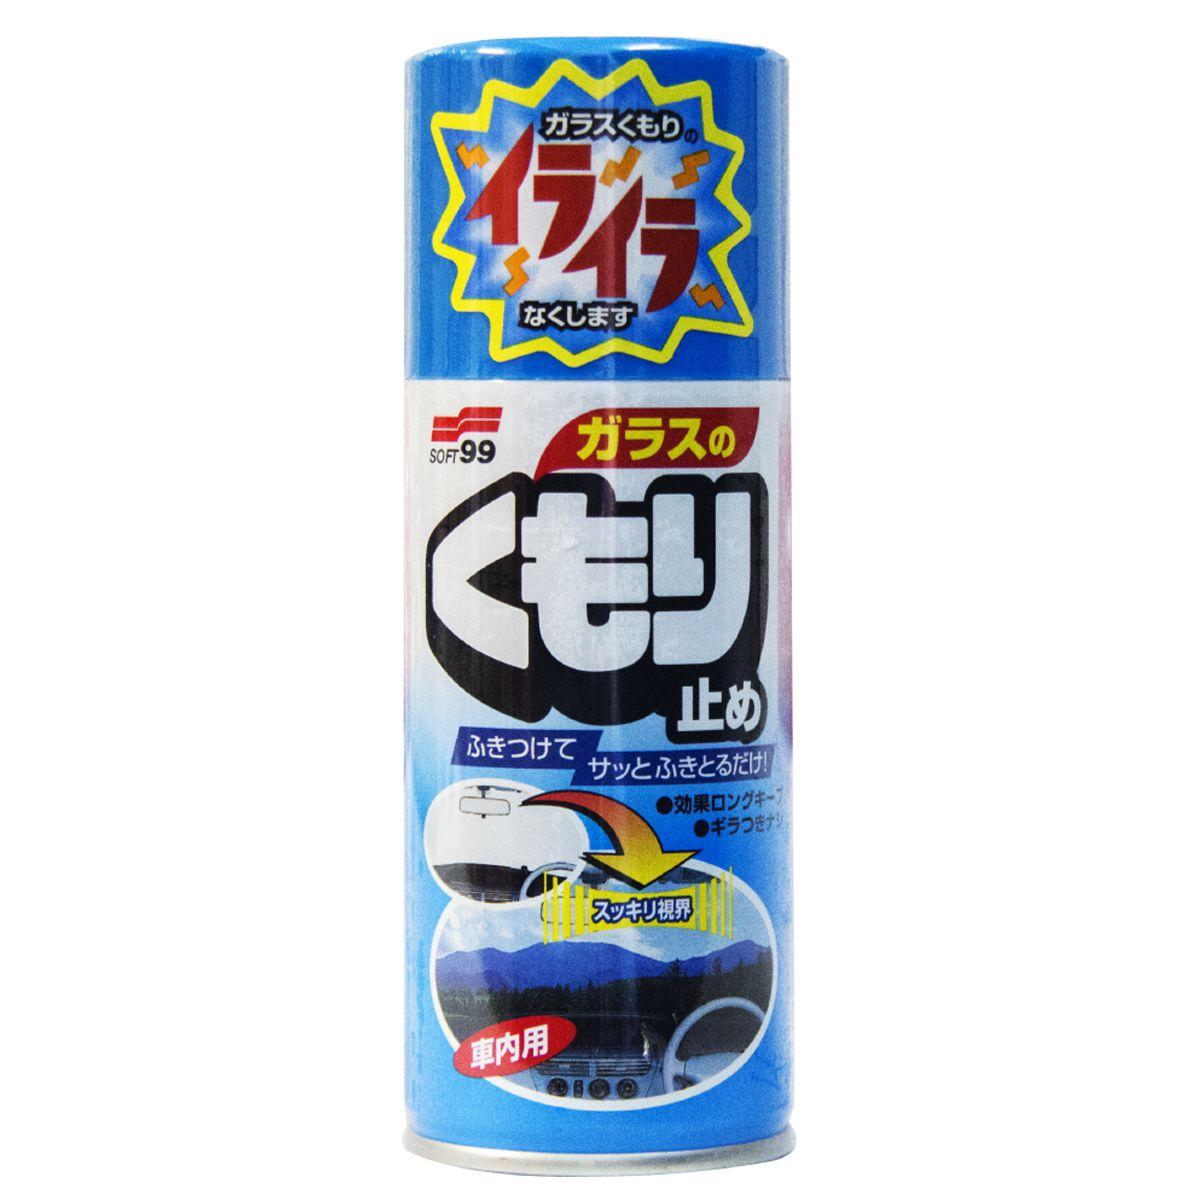 Kit 2 Anti Embaçante Aerossol+ Gel Fukupika Soft99